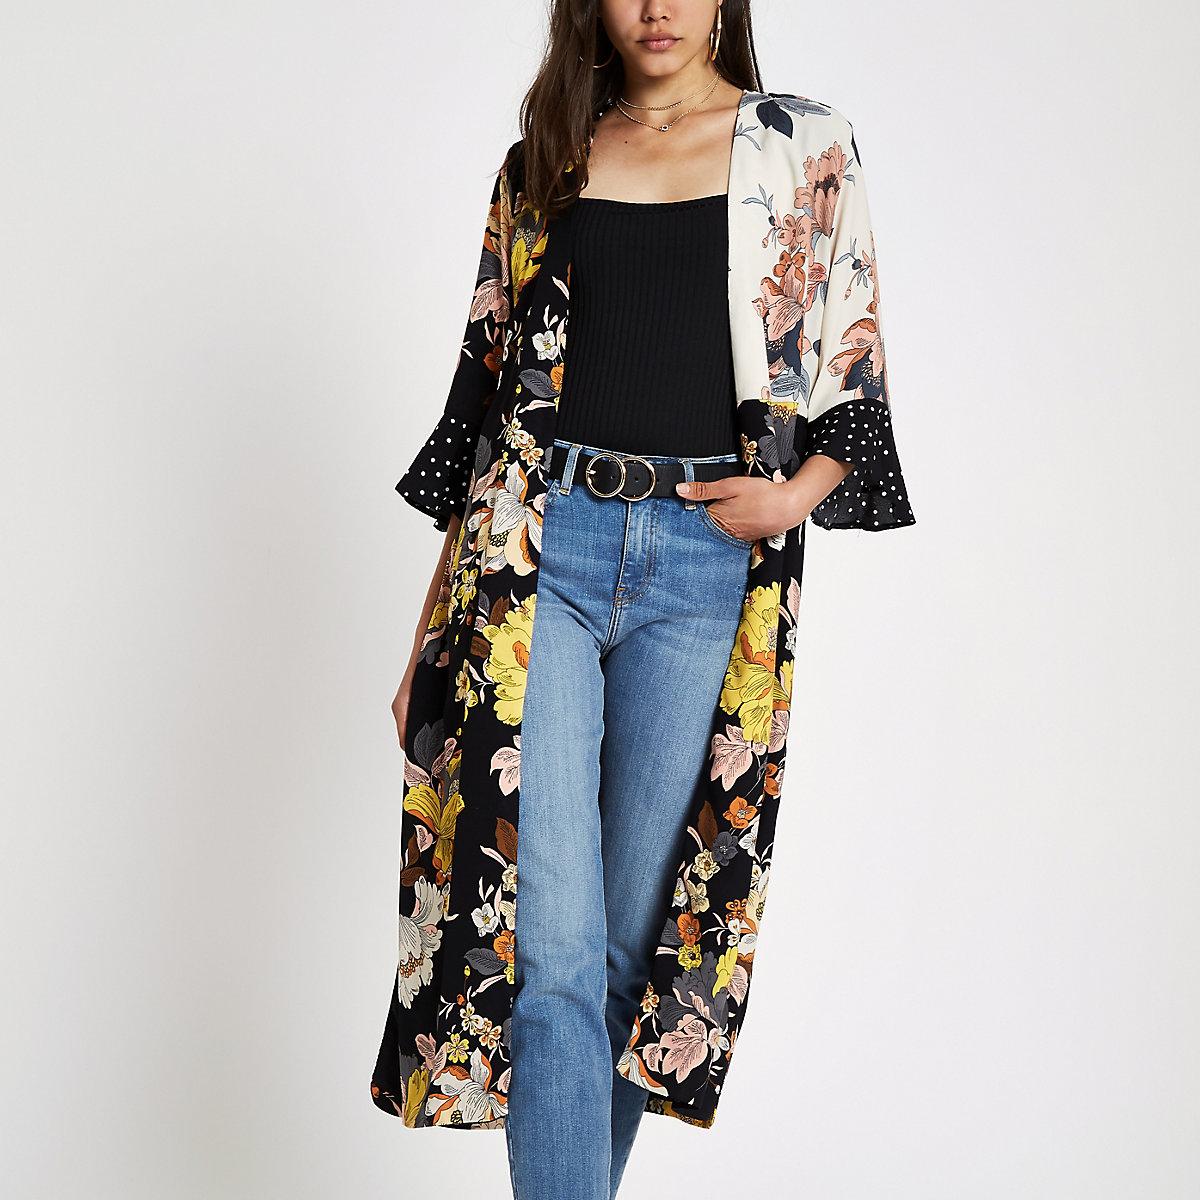 Black mixed floral print duster coat